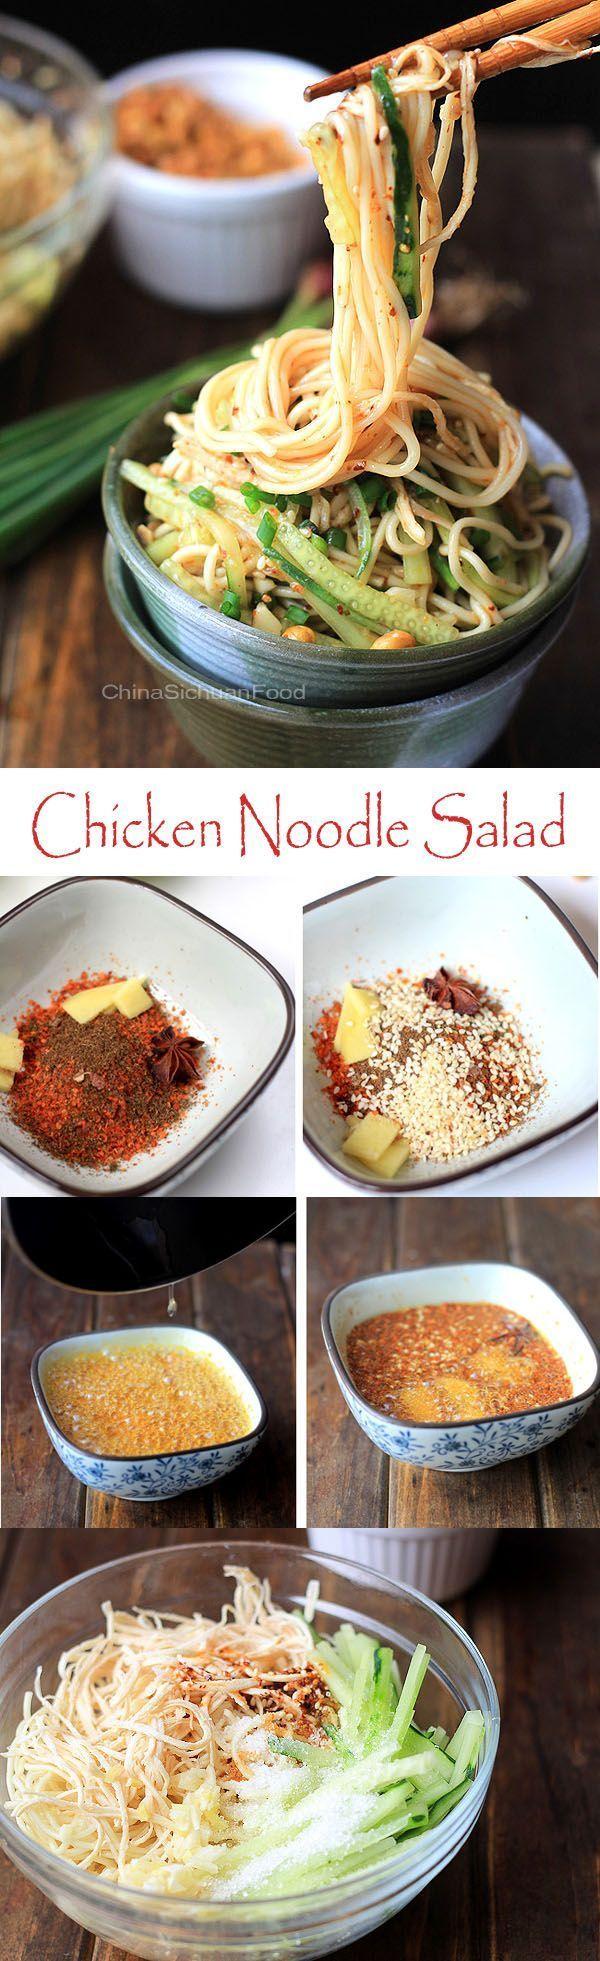 Chicken Noodle Salad- Sichuan Liang Mian | China Sichuan Food